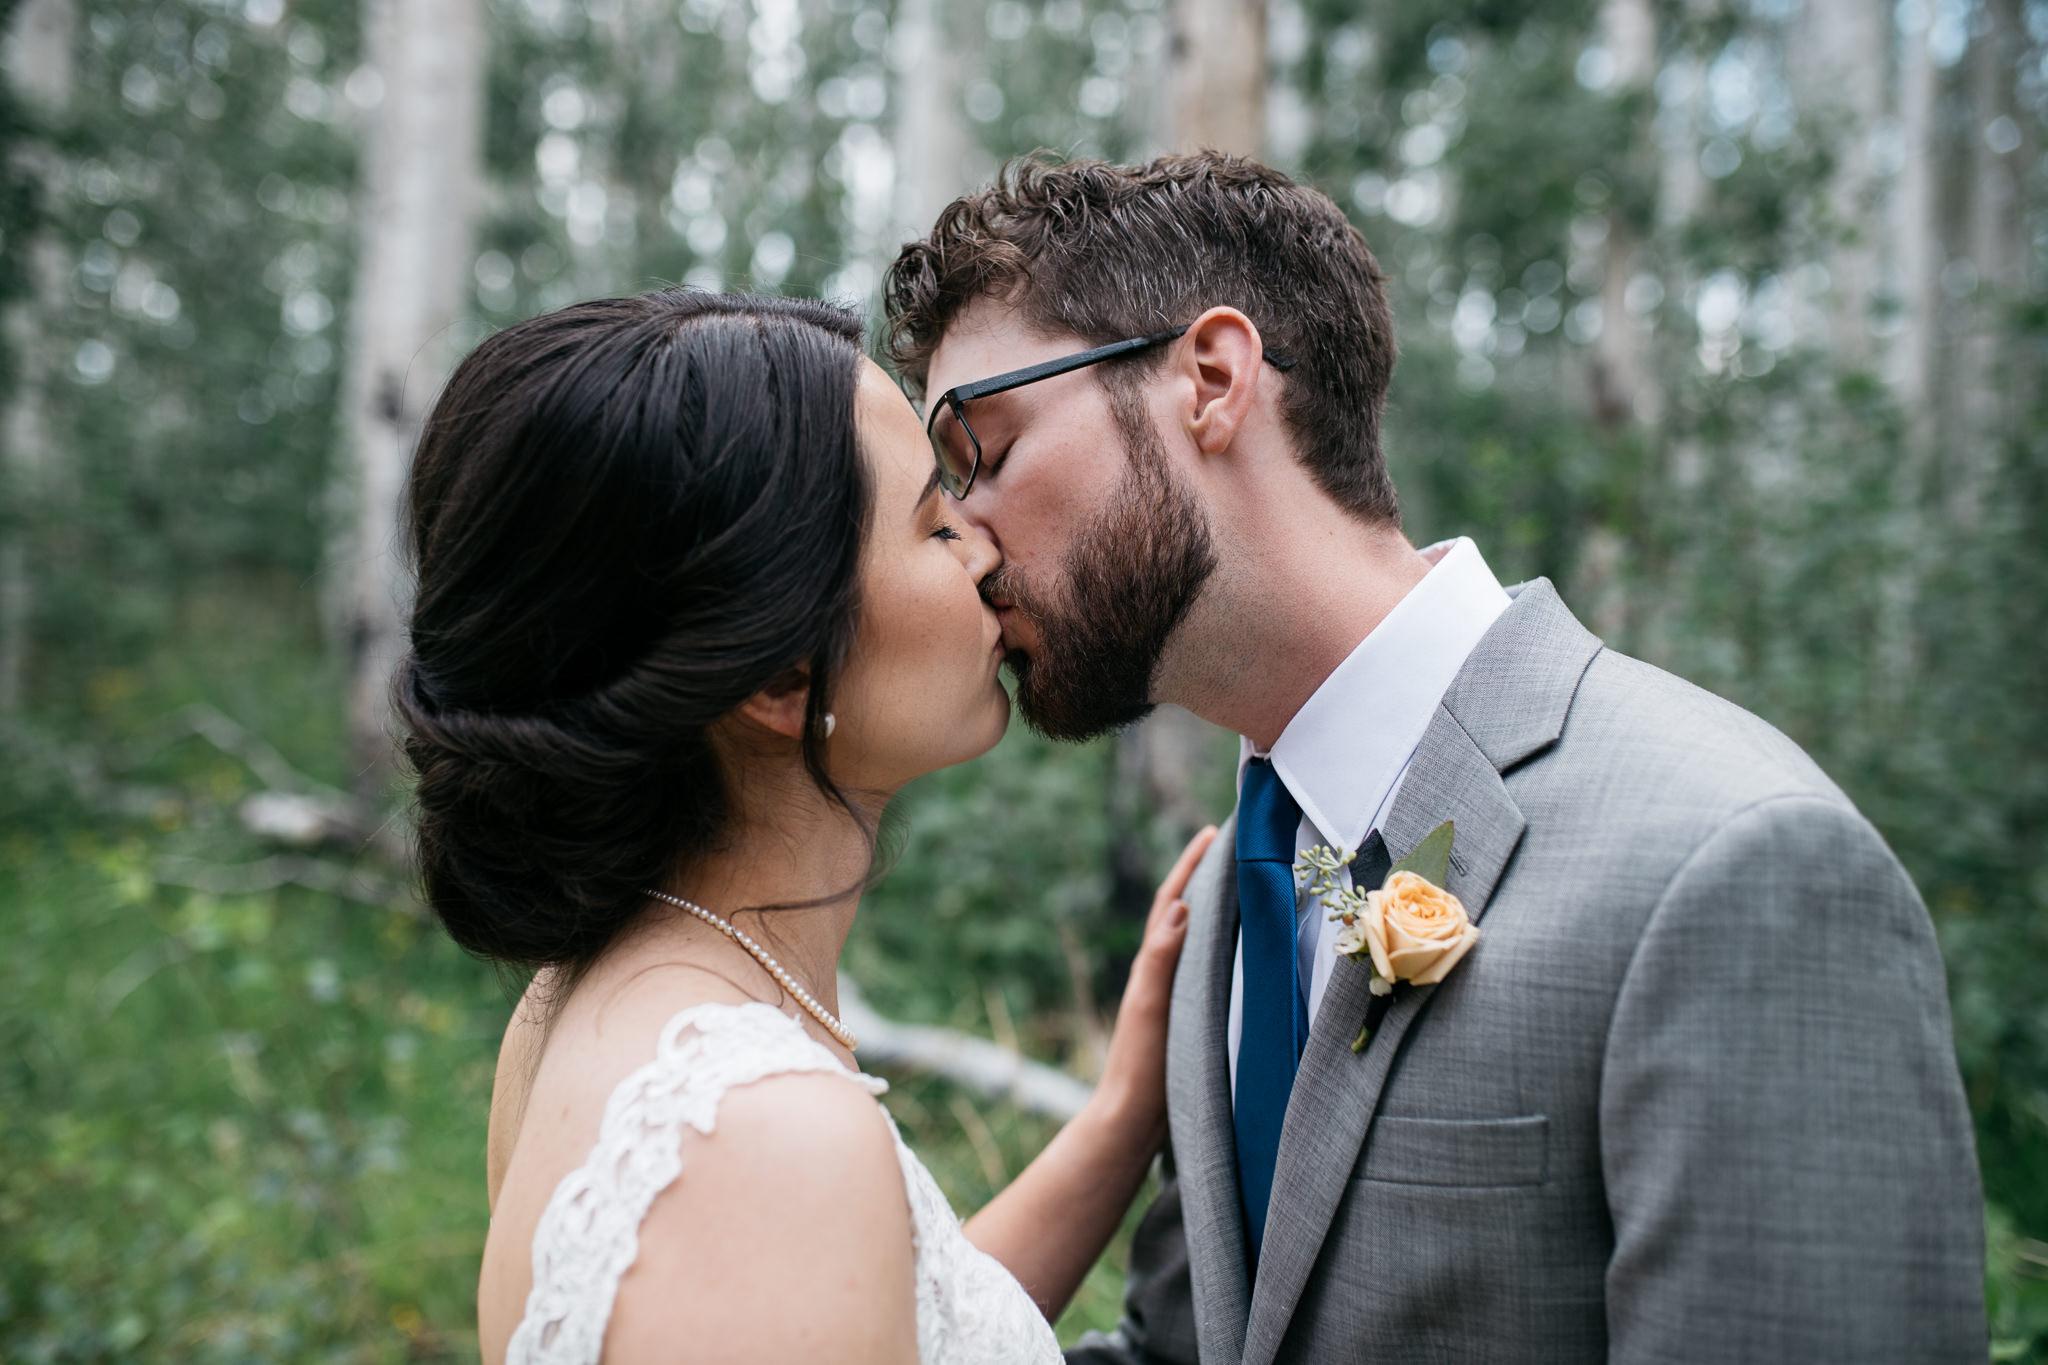 099_ONL_Kat_Nick_Wedding_Trevor_Hooper_Photo.jpg